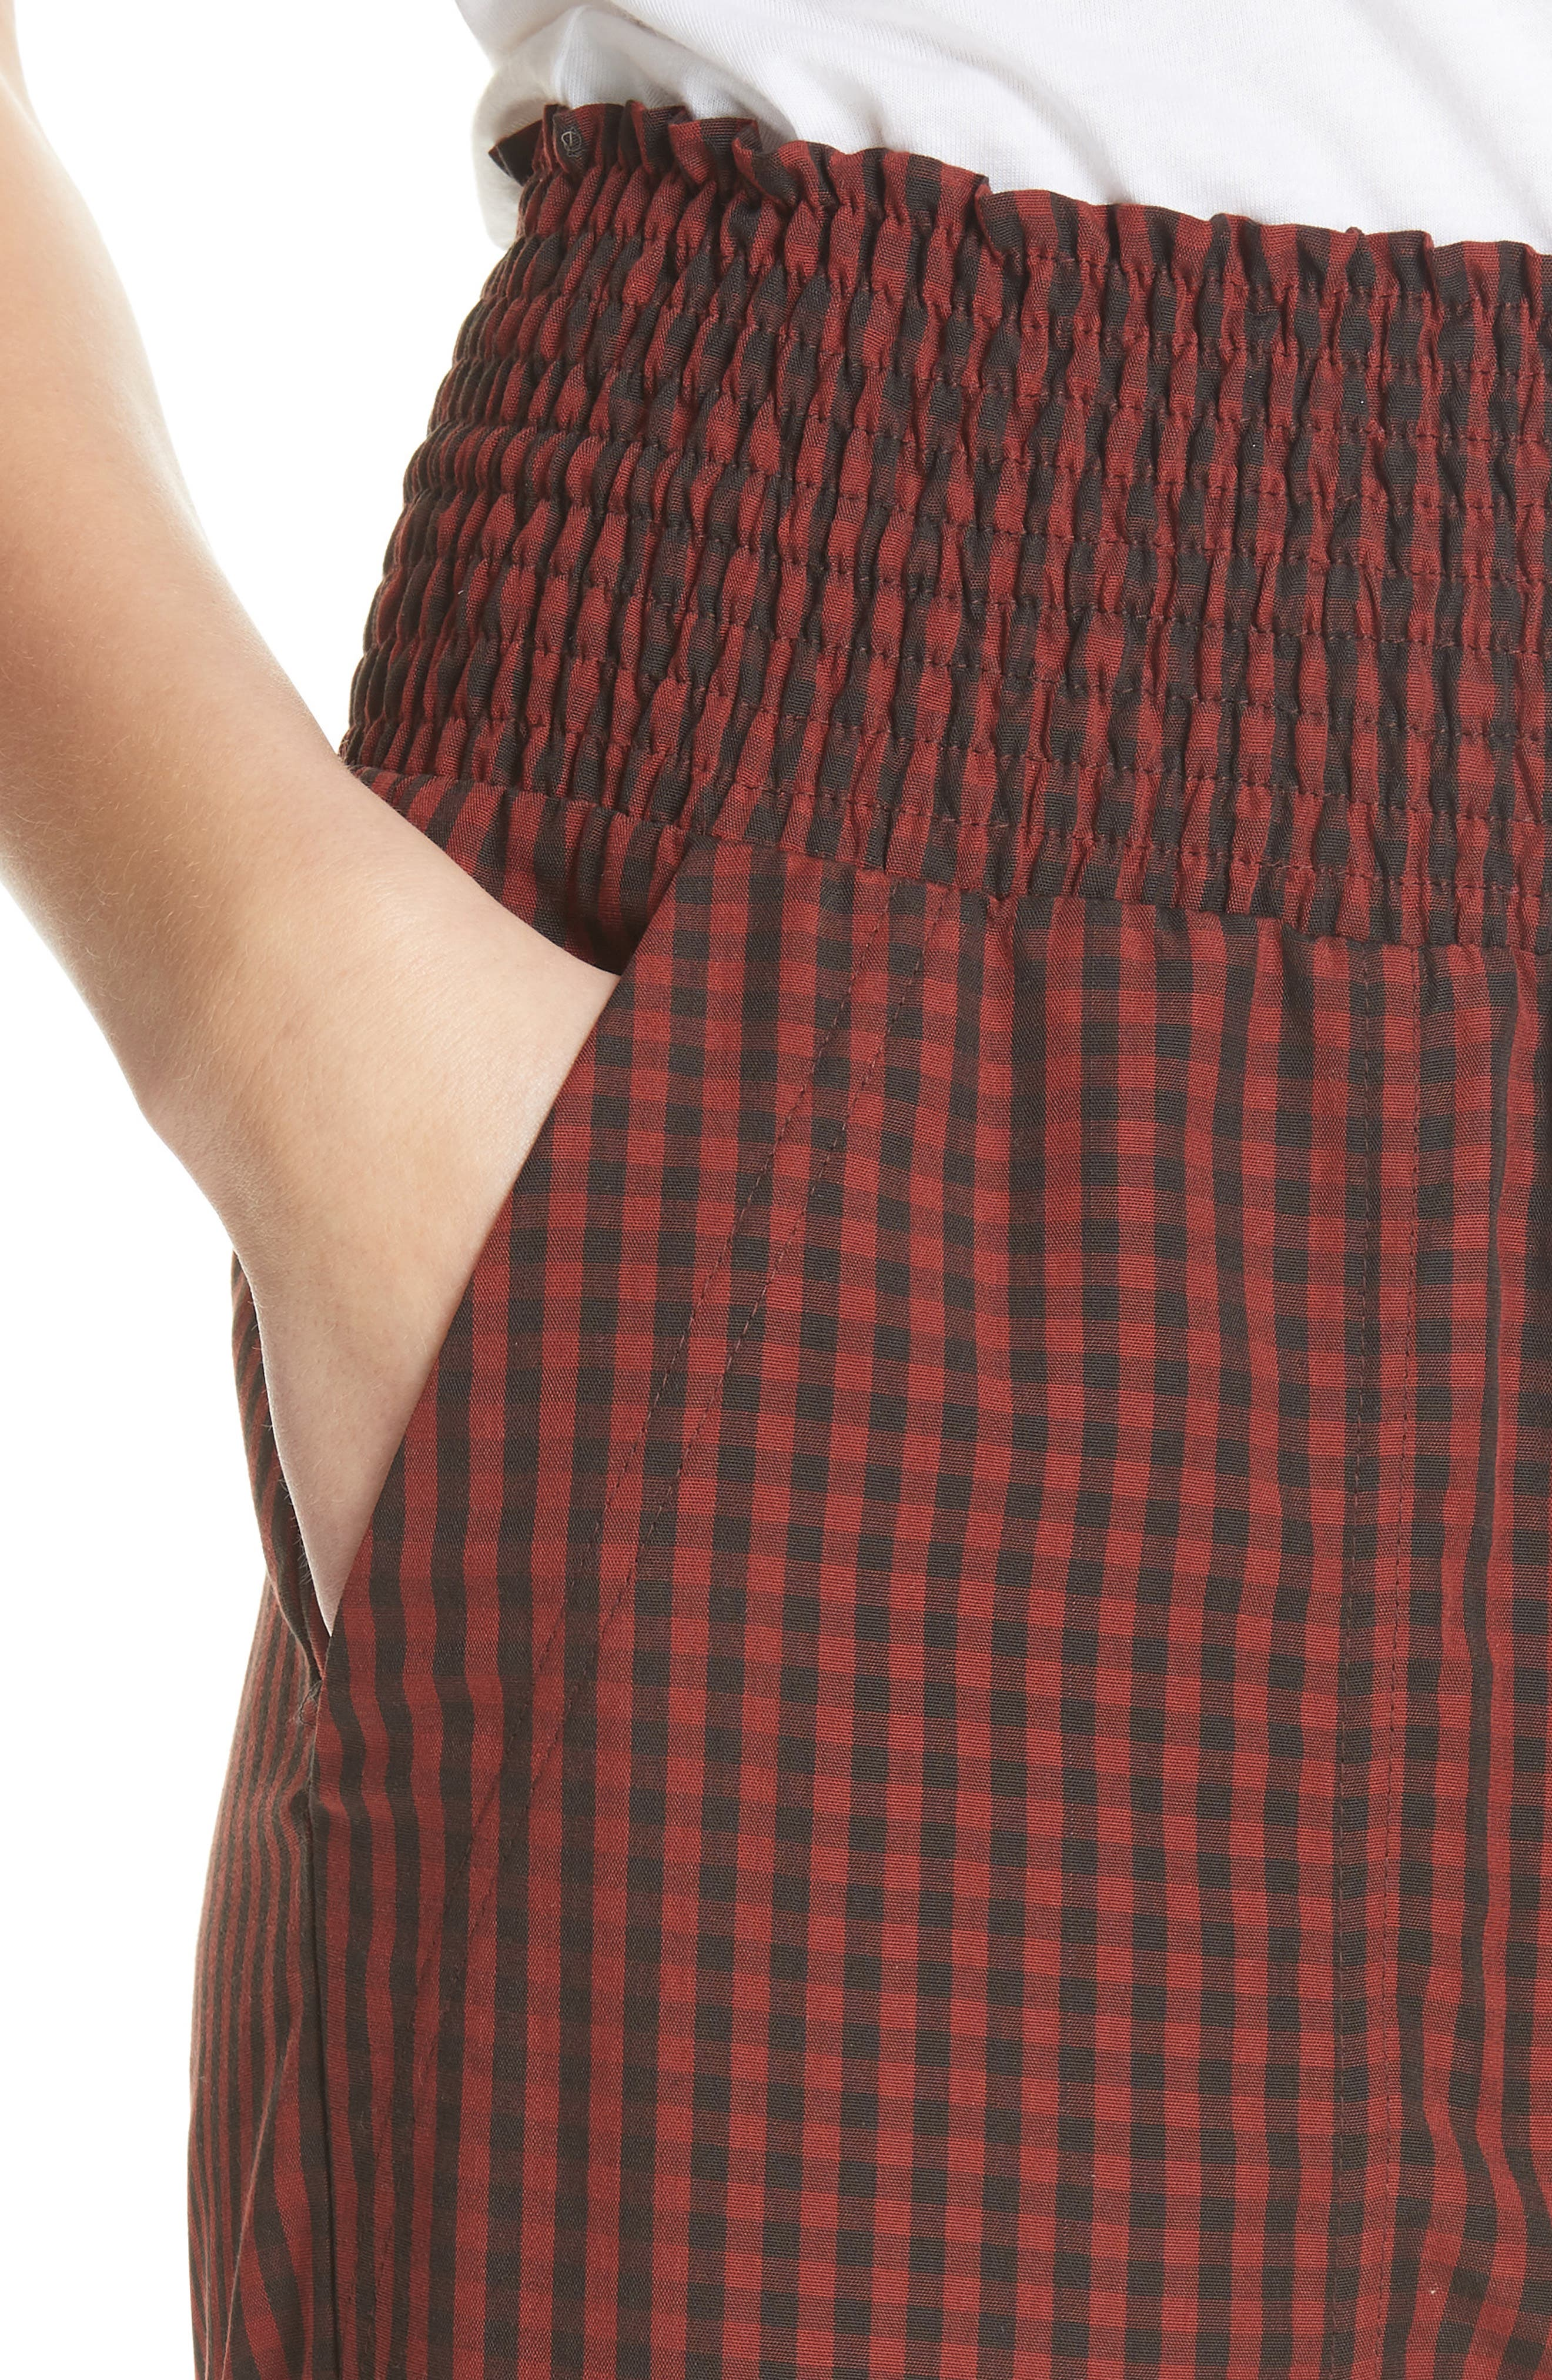 Harlem Gingham Crop Pants,                             Alternate thumbnail 4, color,                             RED CHECK